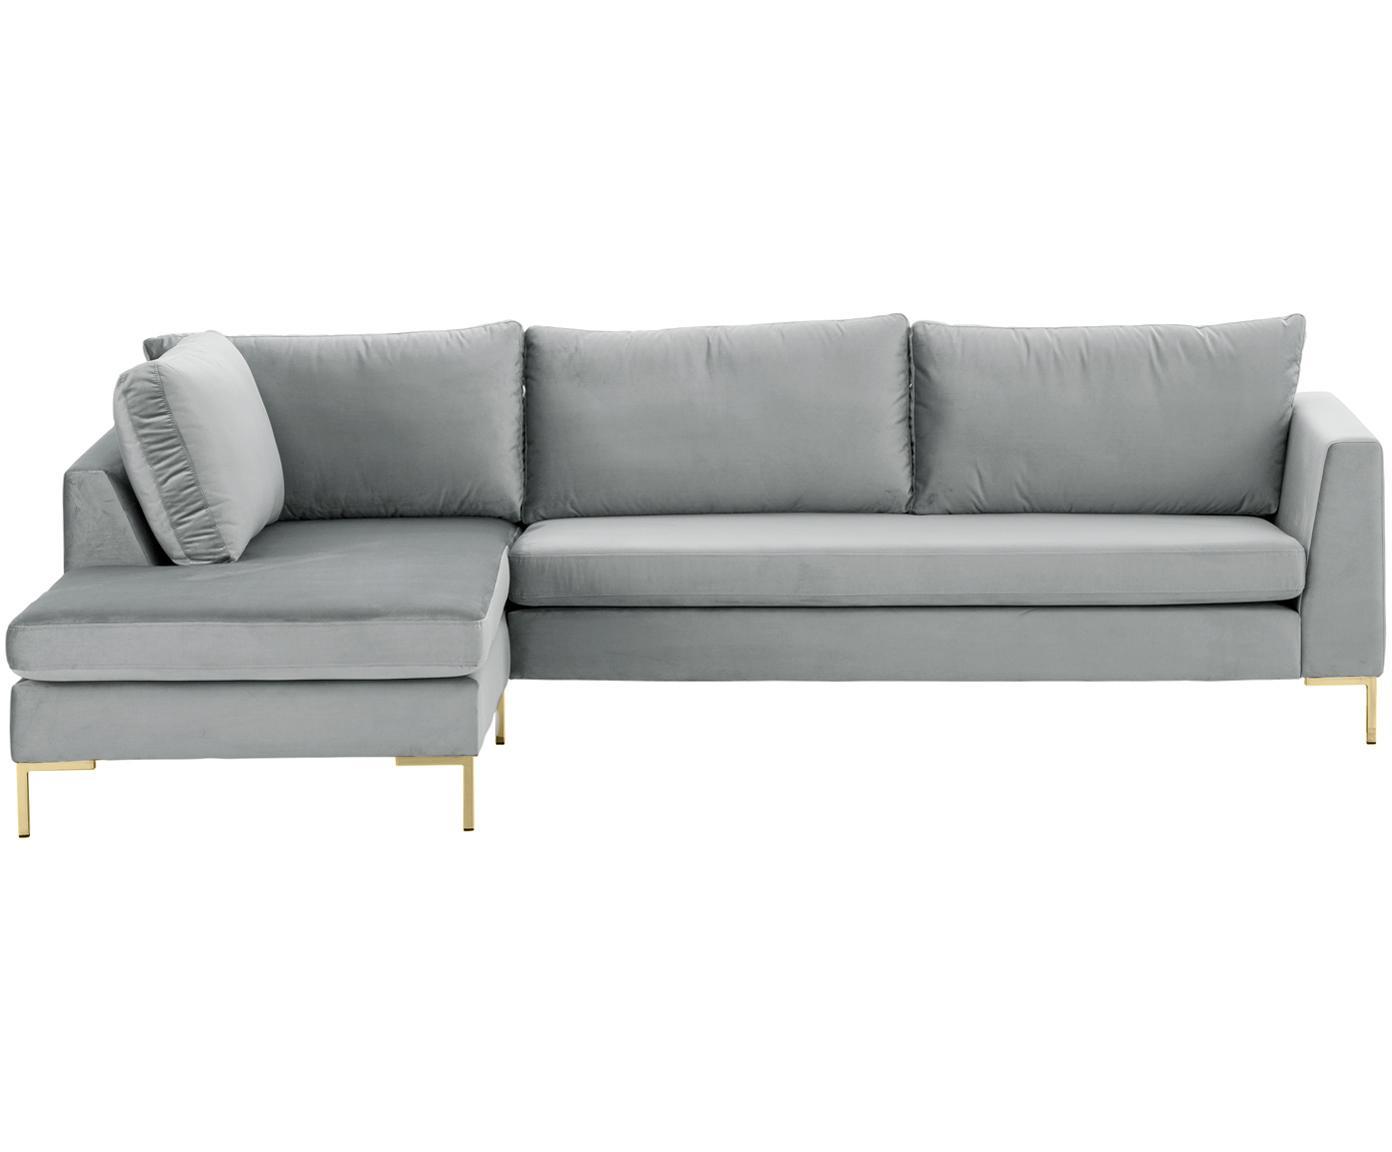 Samt-Ecksofa Luna, Bezug: Samt (Polyester) 80.000 S, Gestell: Massives Buchenholz, Samt Hellgrau, Gold, B 280 x T 184 cm